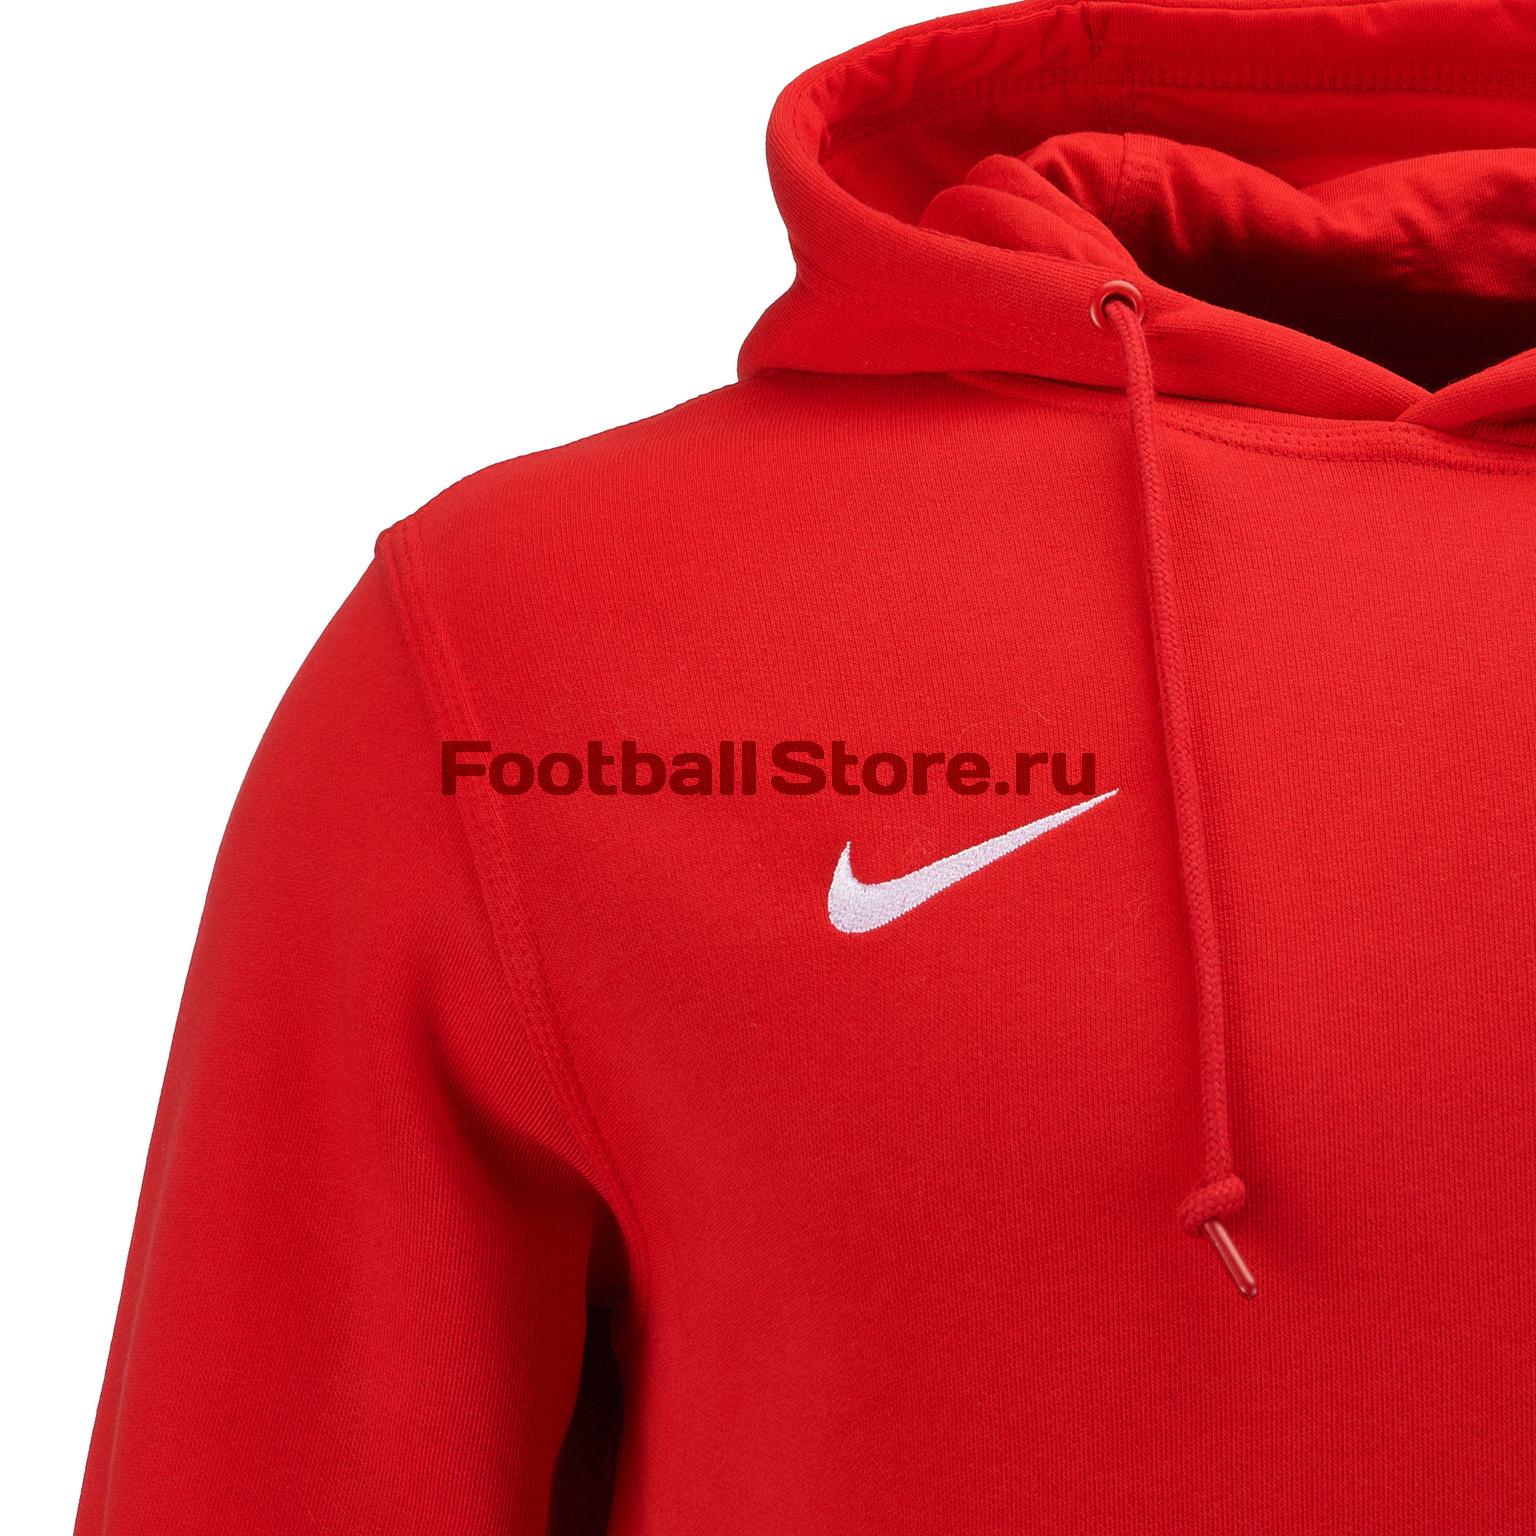 6fa7f86d Толстовка Nike Team Club Hoody 658498-657 – купить в интернет ...